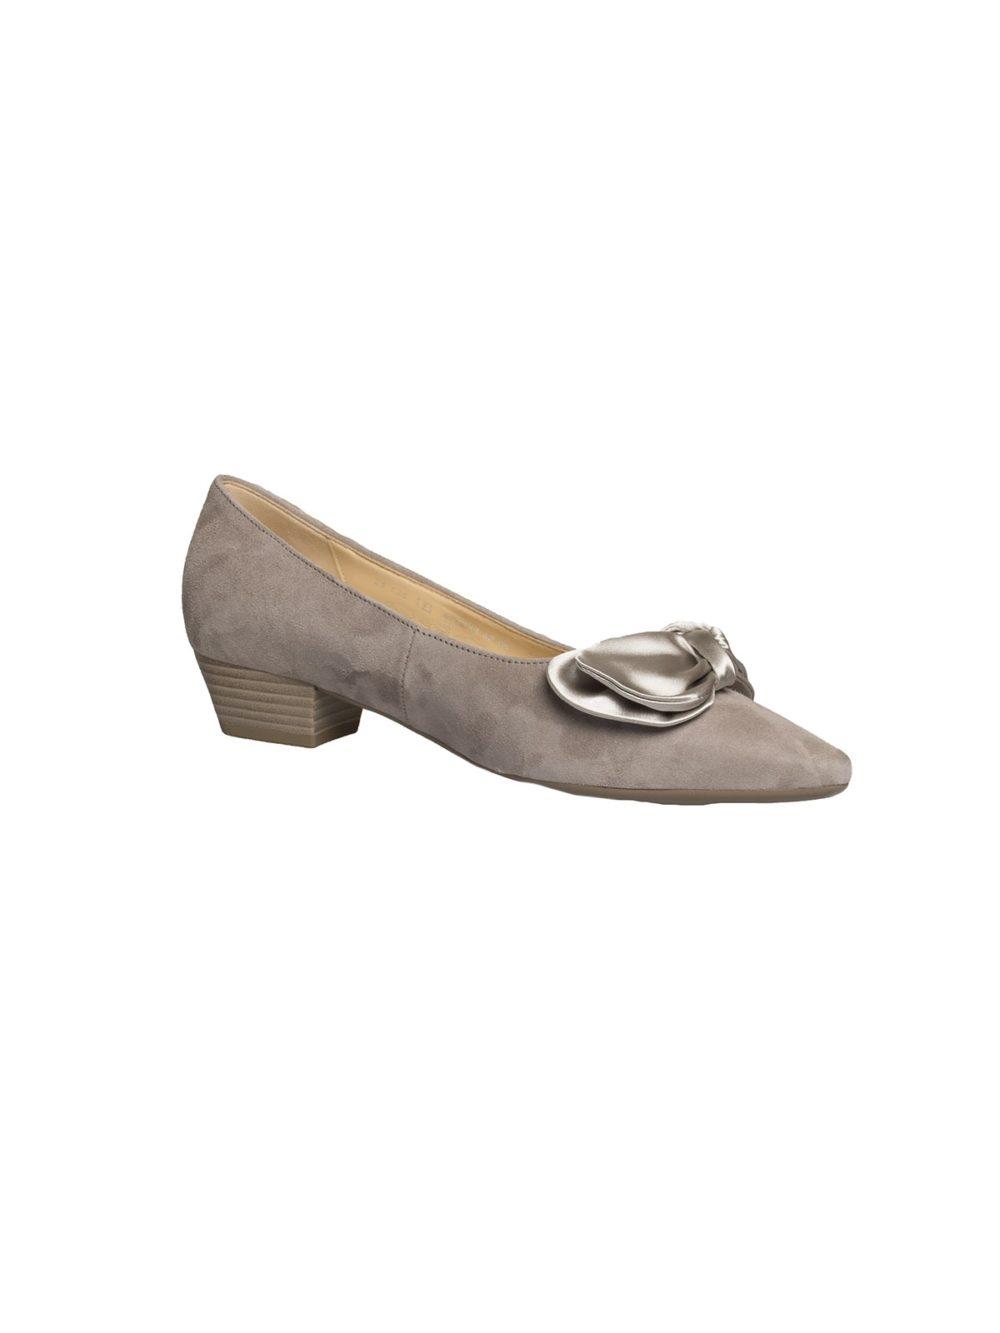 Oceana Shoe Gabor Shoes Katie Kerr Women's Clothing